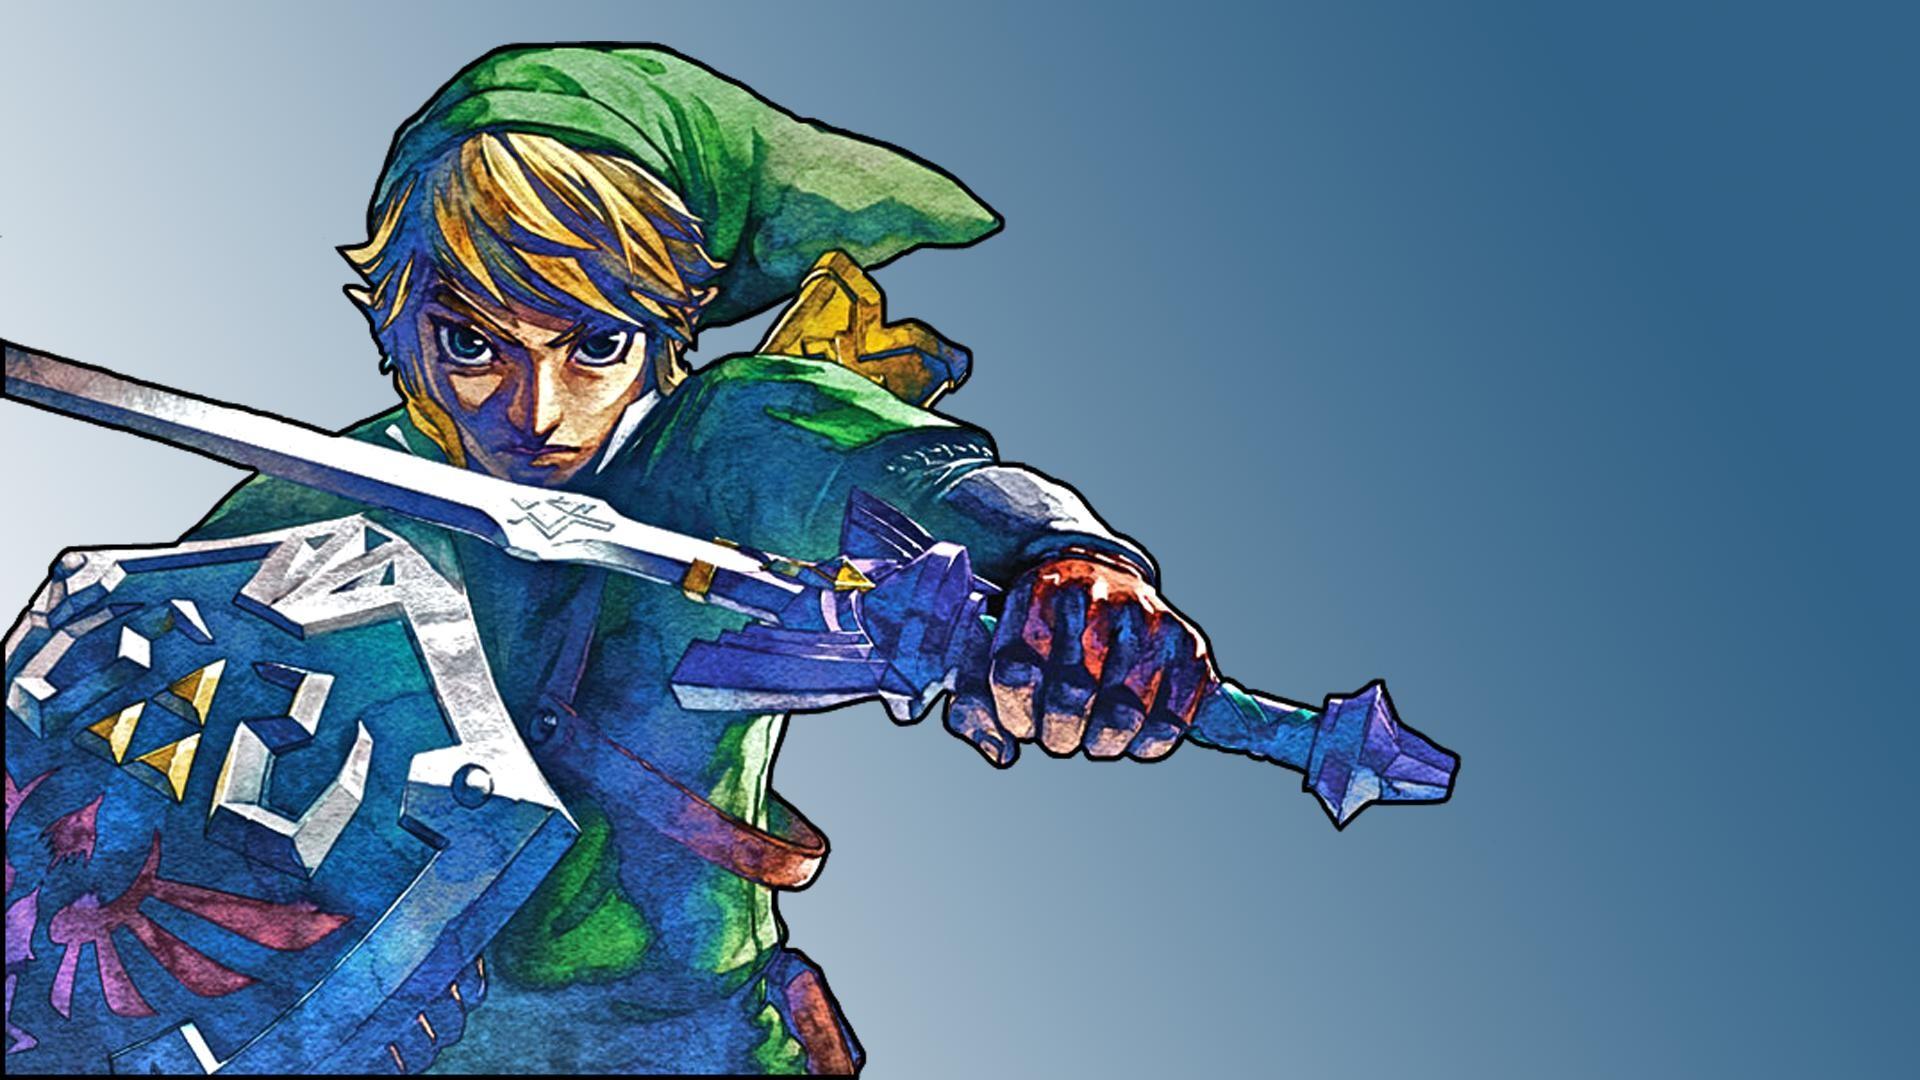 widescreen hd the legend of zelda skyward sword